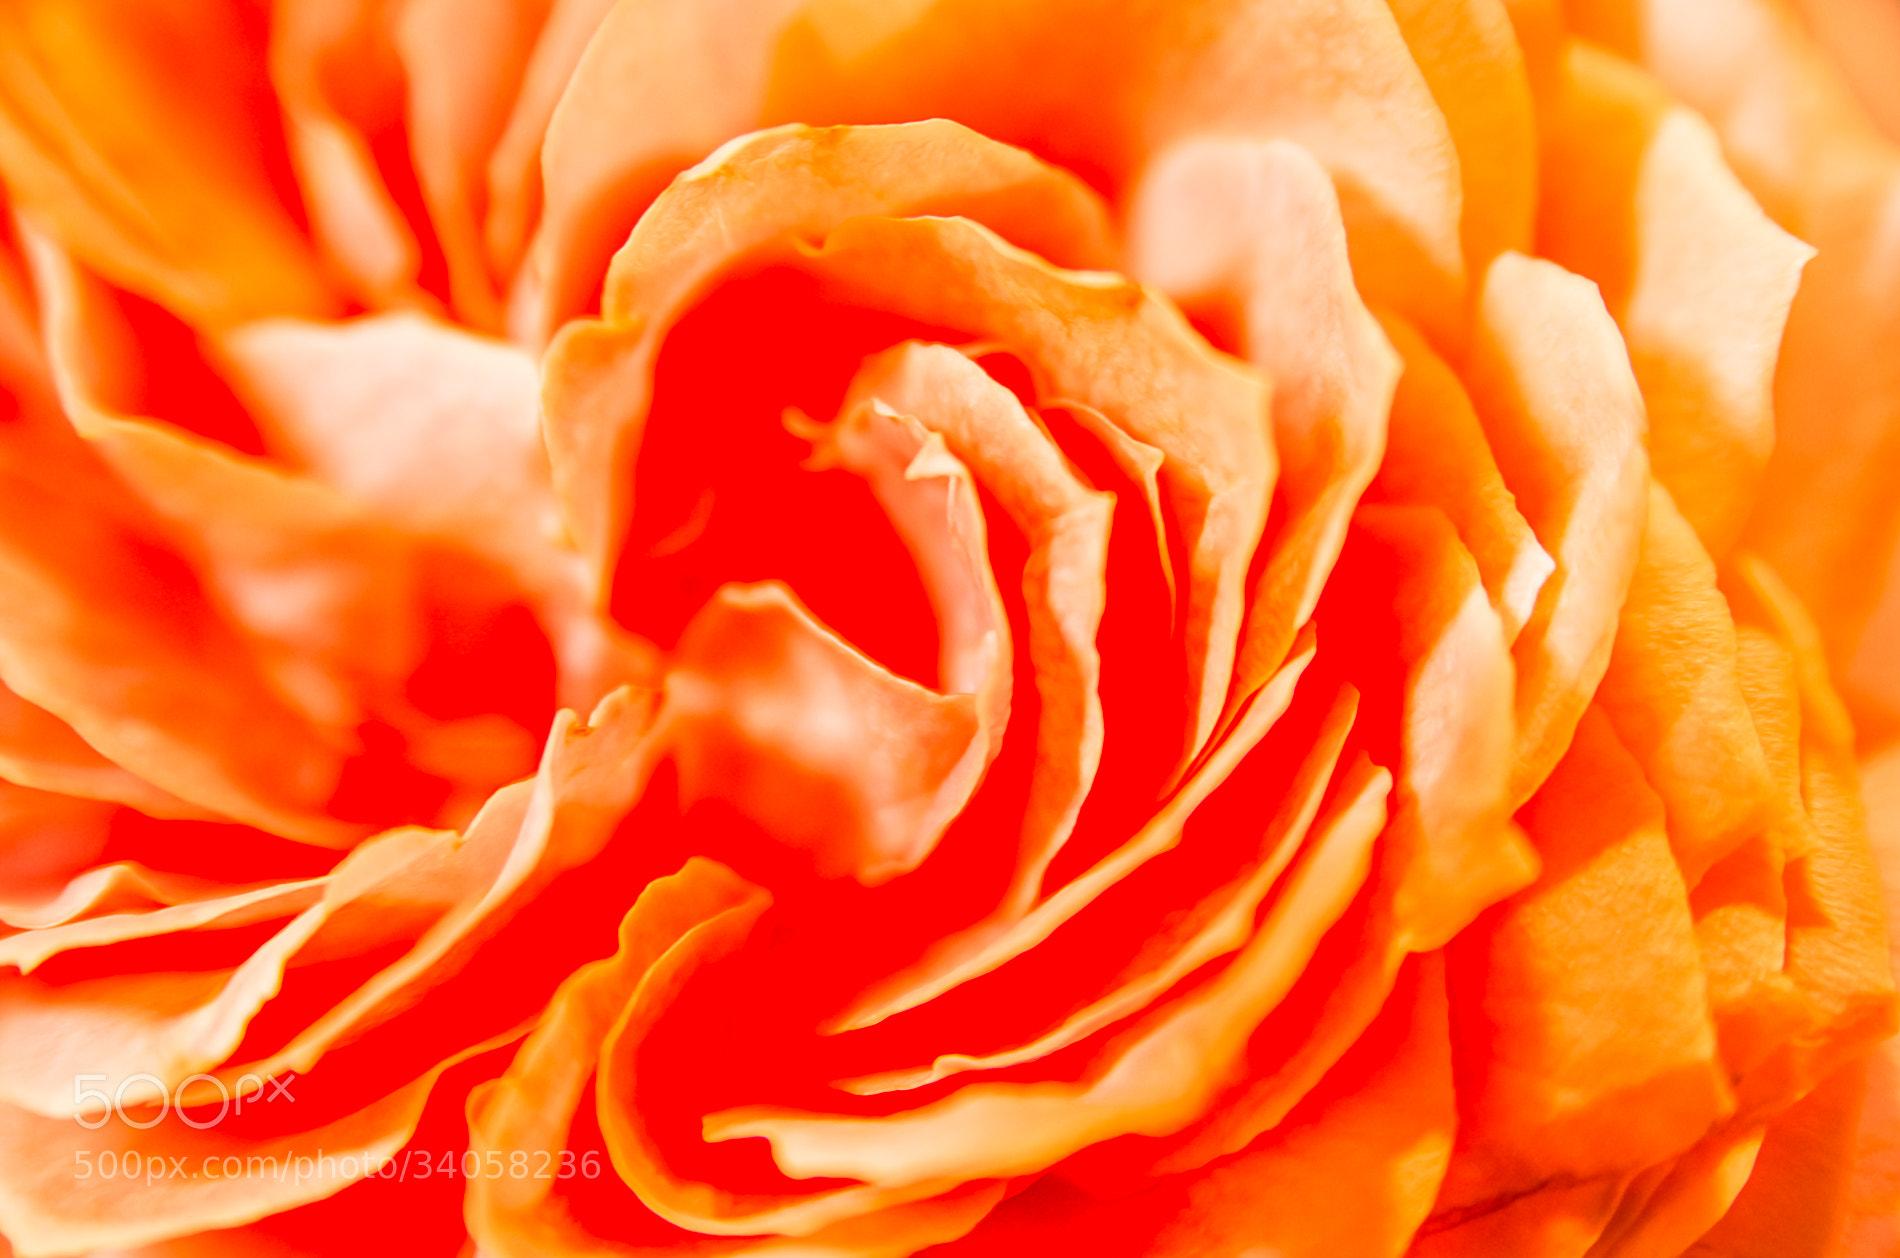 Photograph Rose by Sachiko Kawakami on 500px